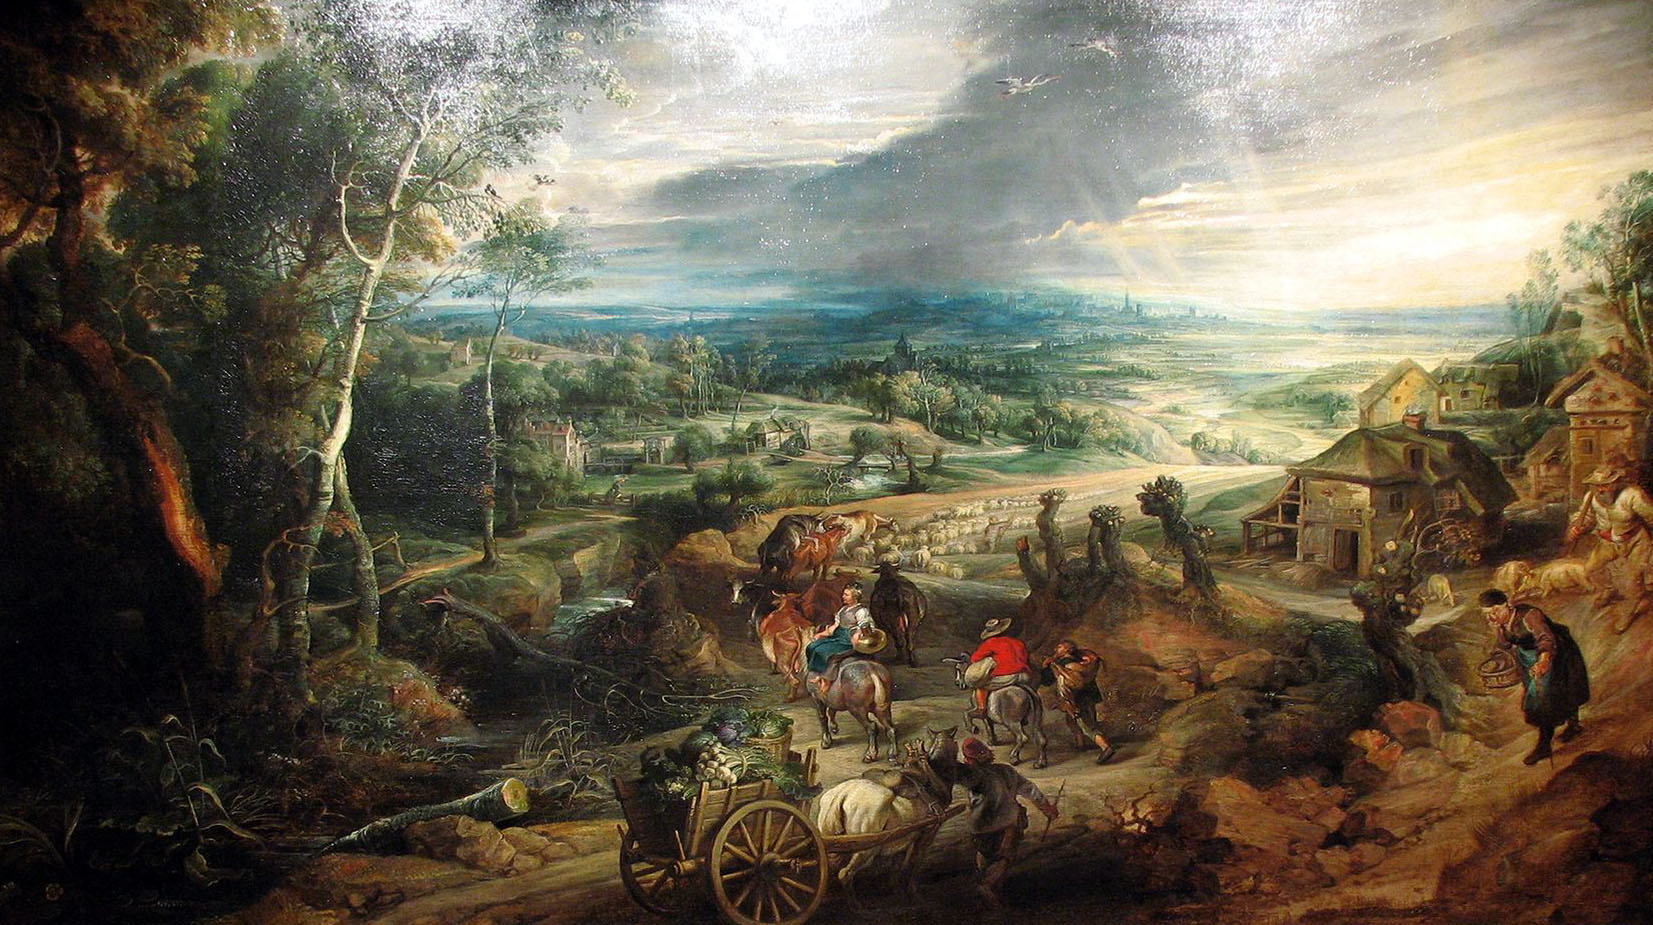 Summer, Peasants going to Market, Peter Paul Rubens